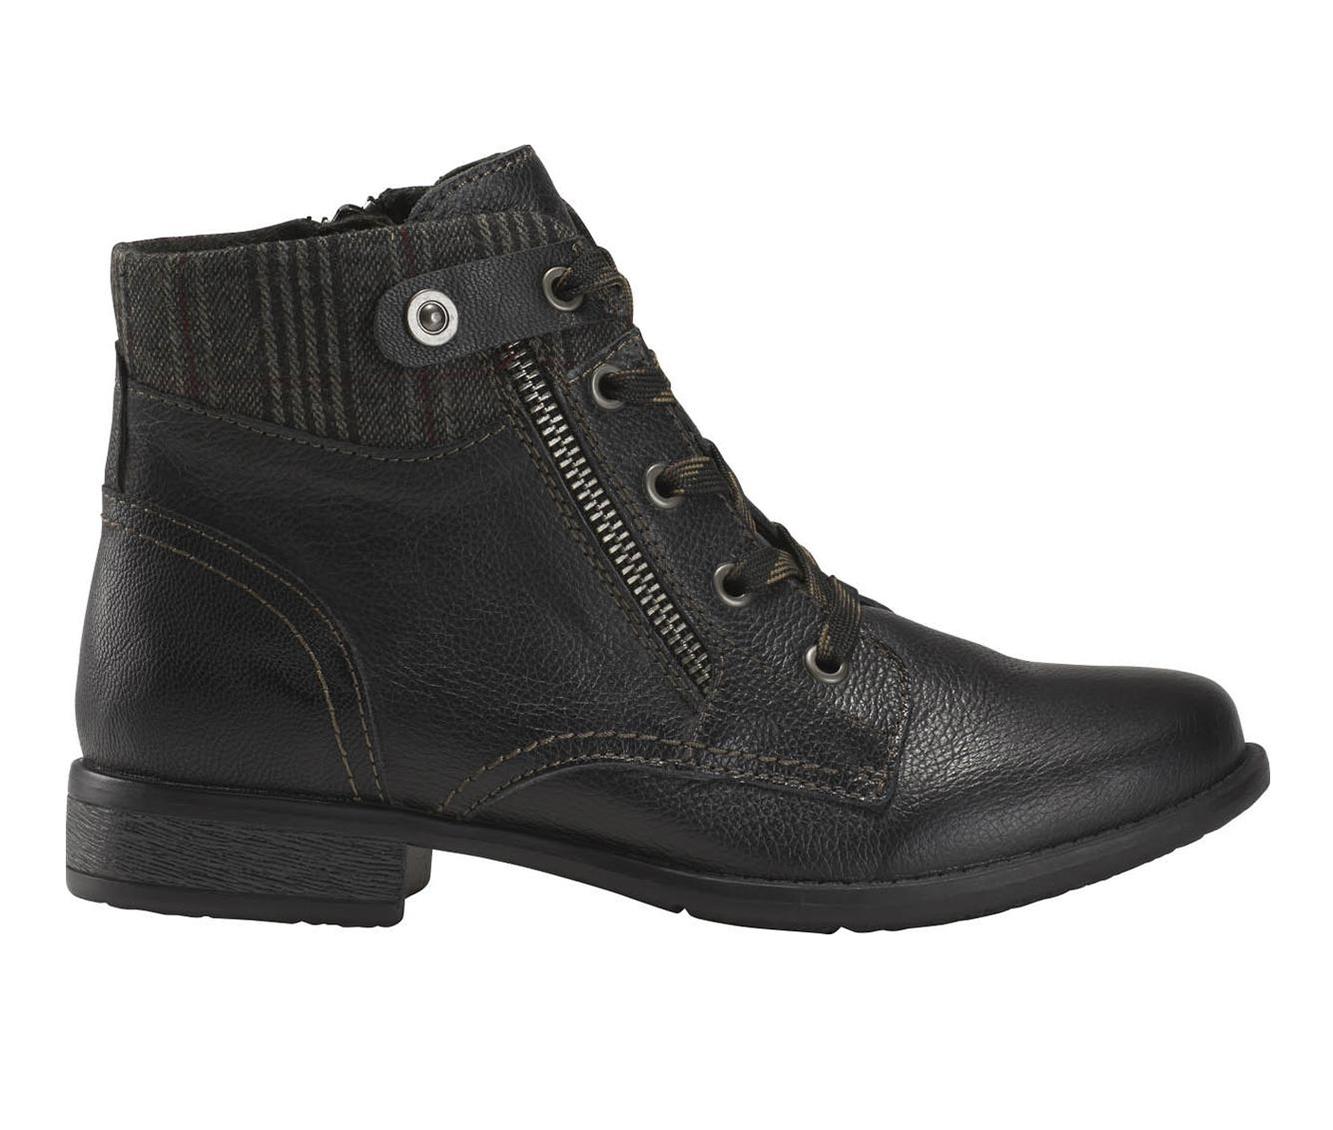 Earth Origins Navigate Nesta Women's Boots (Black - Leather)